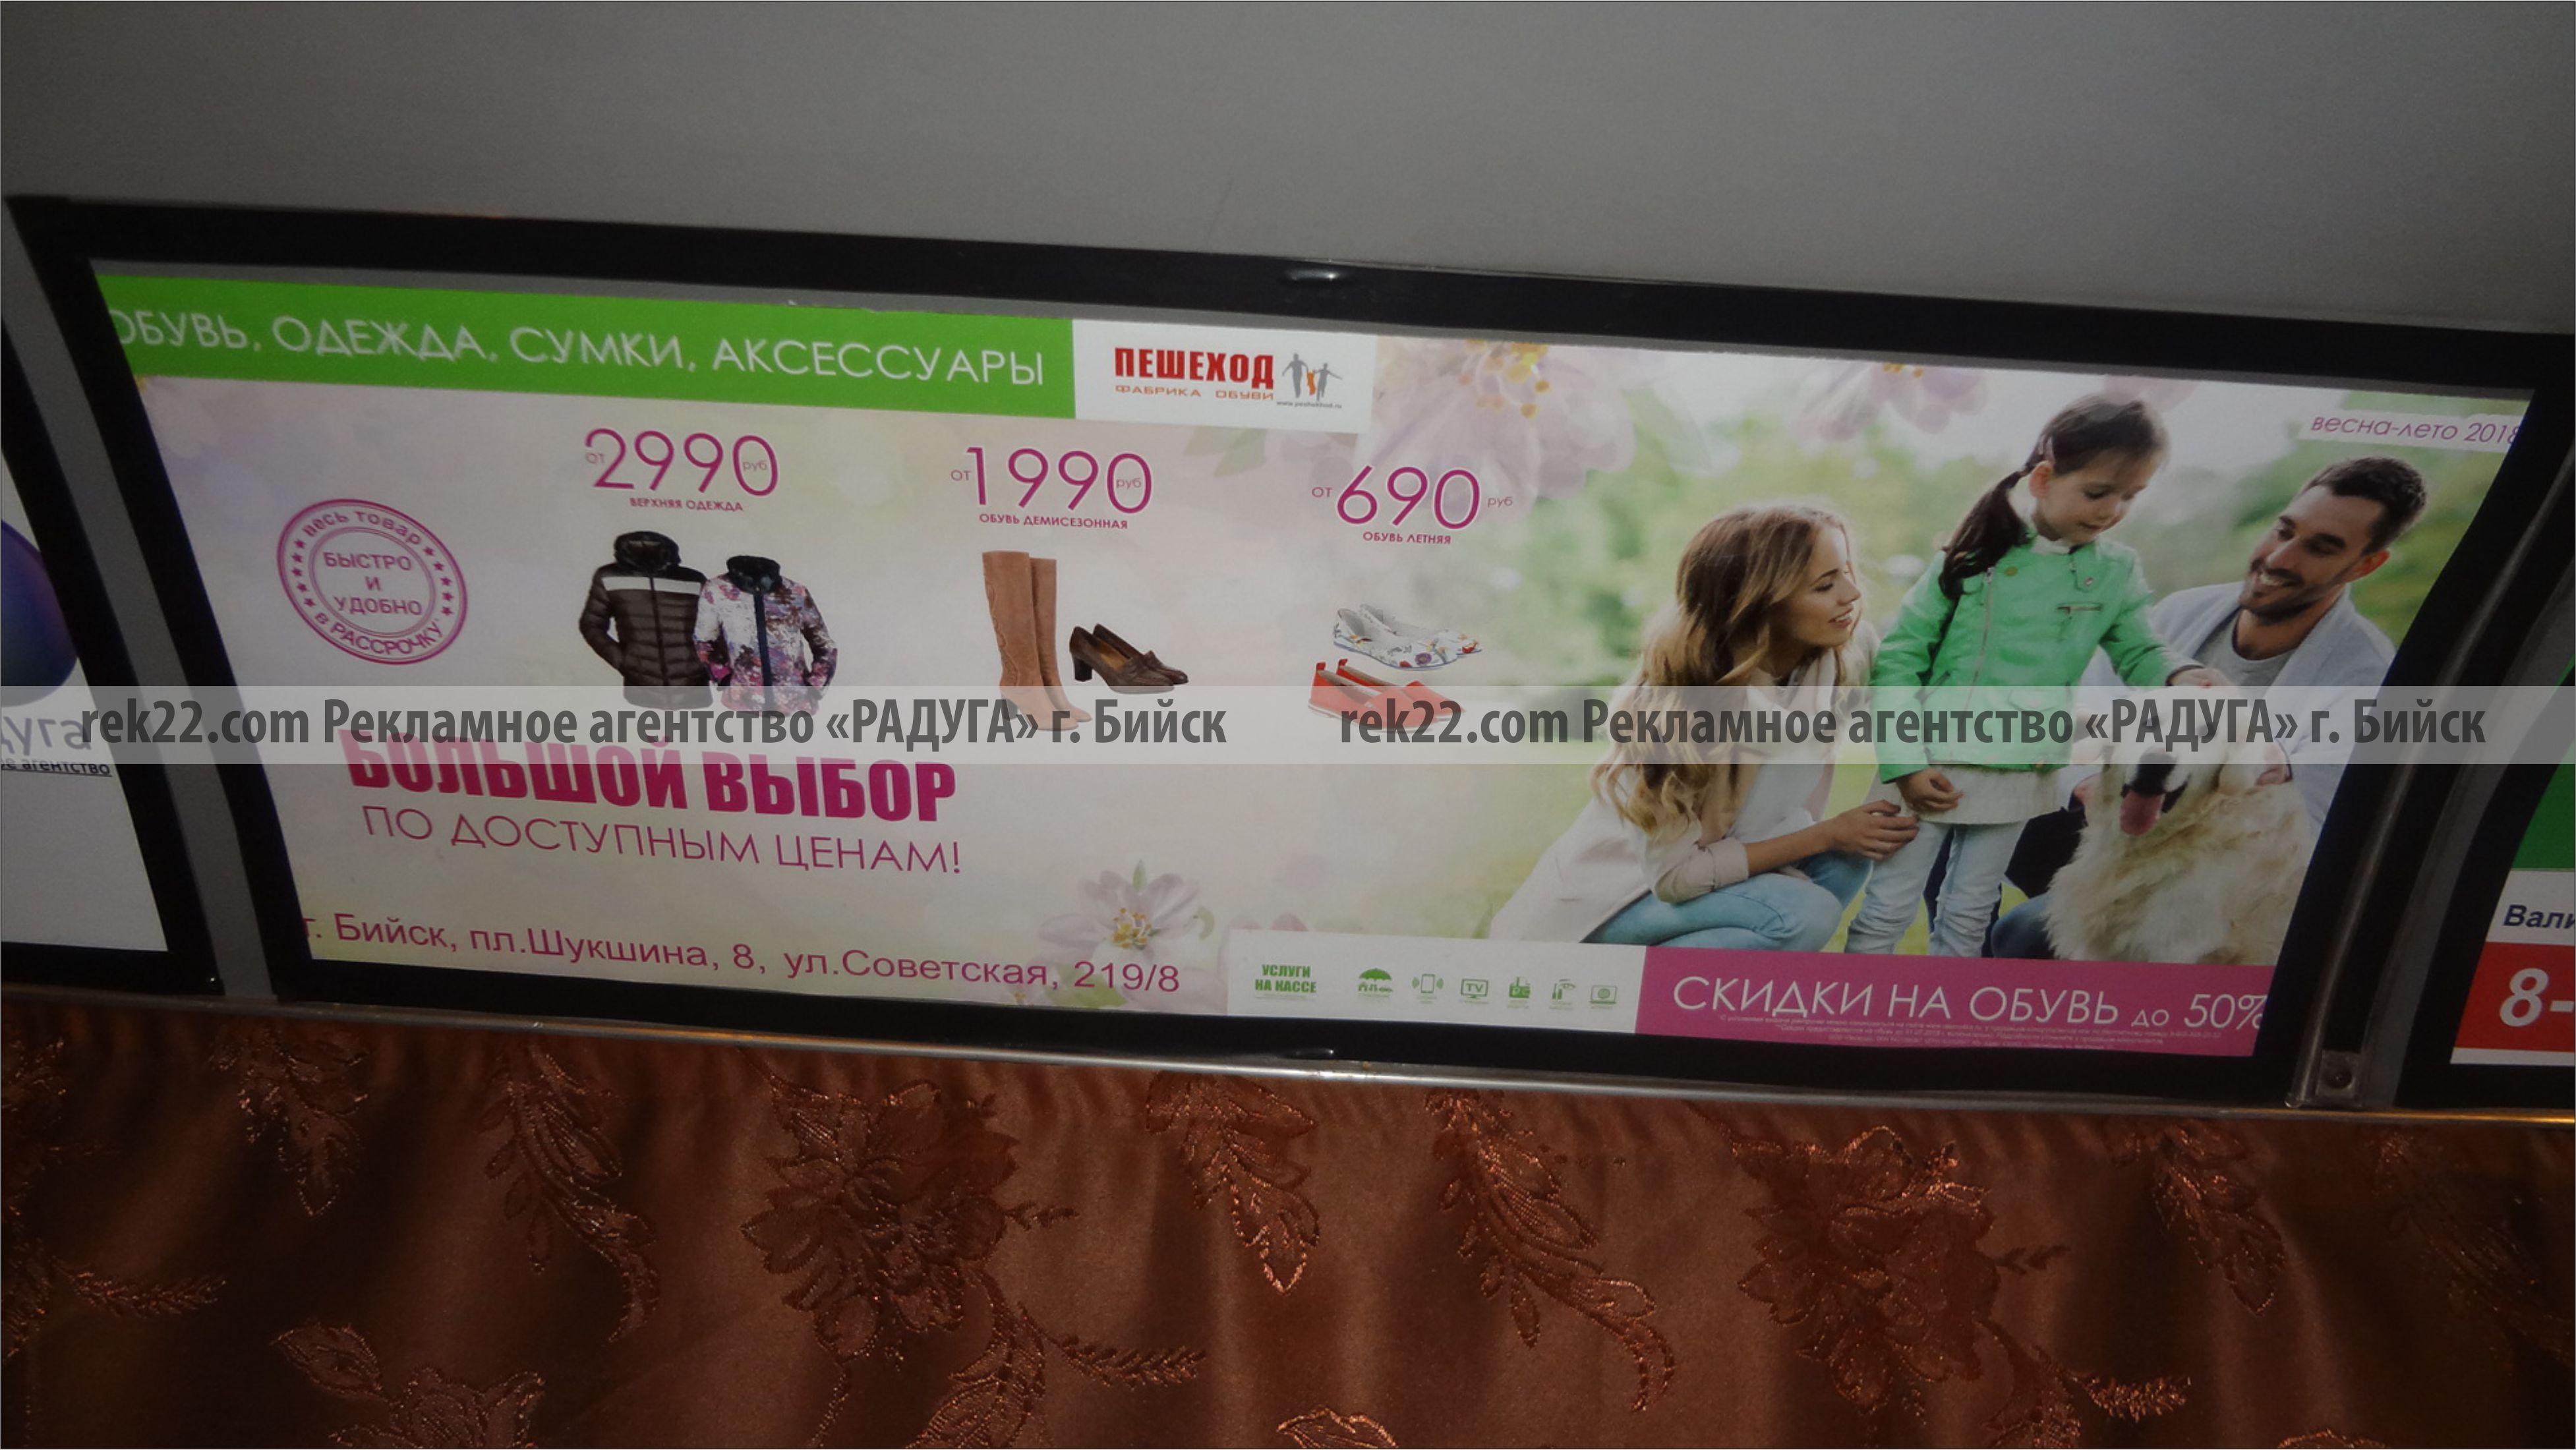 Реклама на транспорте Бийск - карманы, листовки - 12